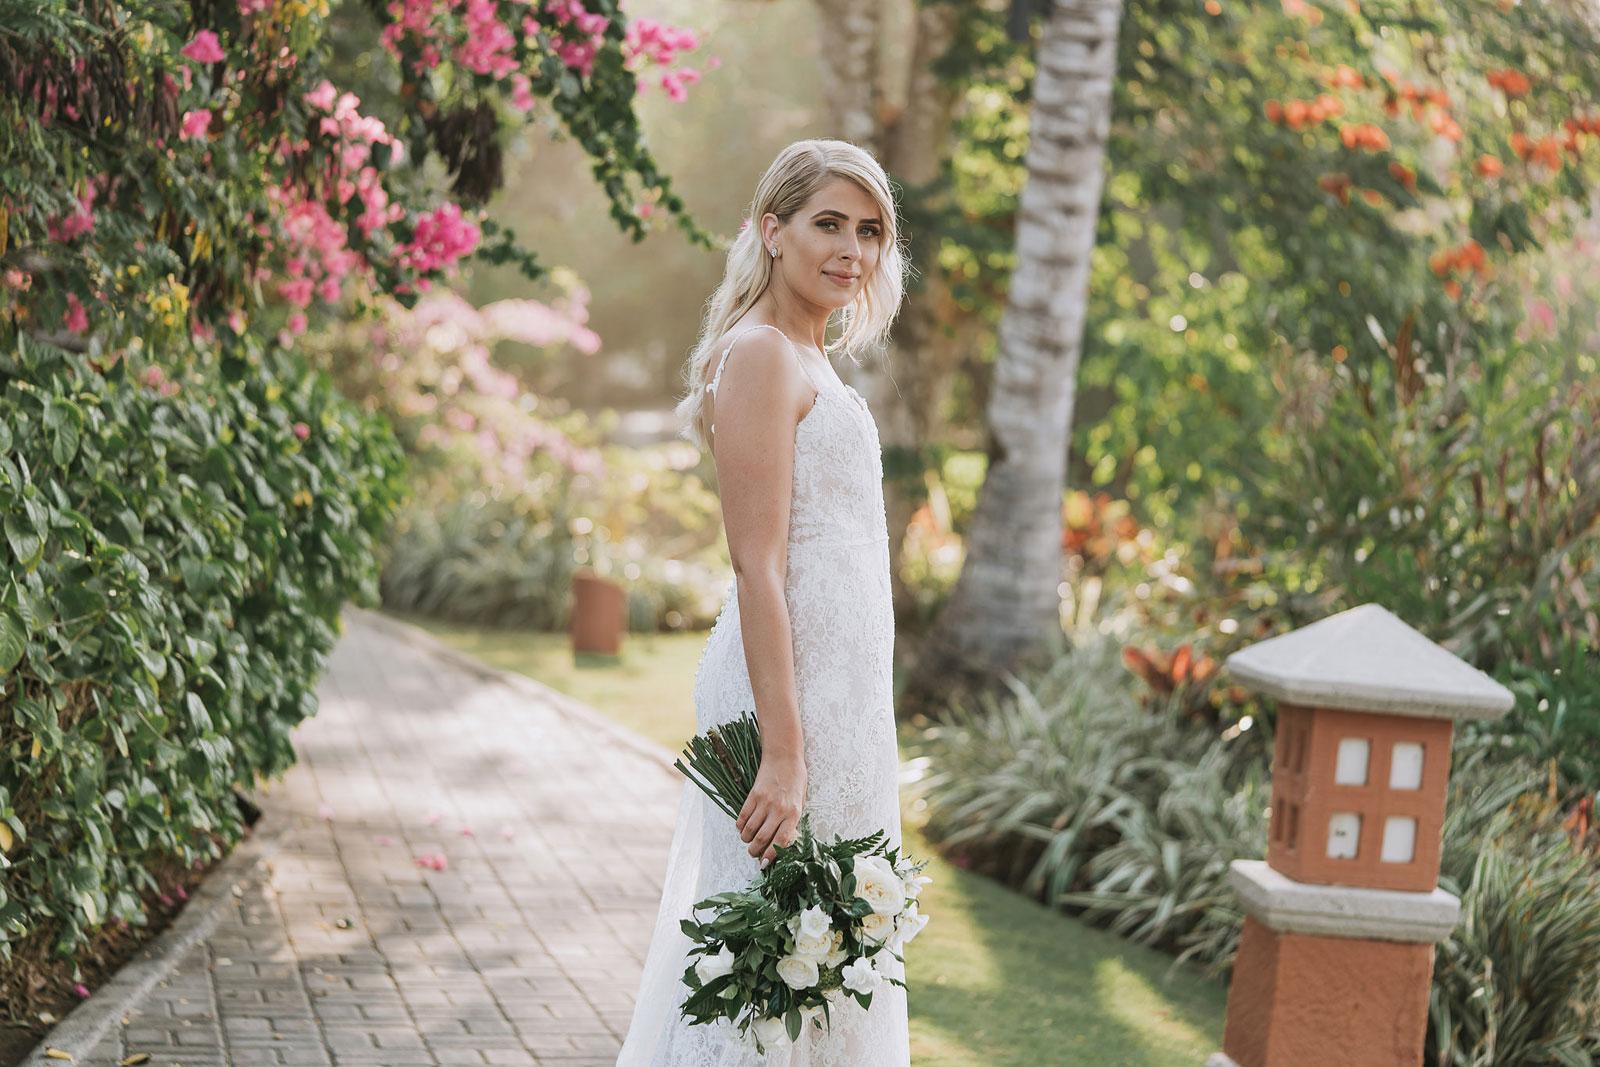 newfound-j-j-bali-nusa-dua-wedding-wedding-photographer-058-a